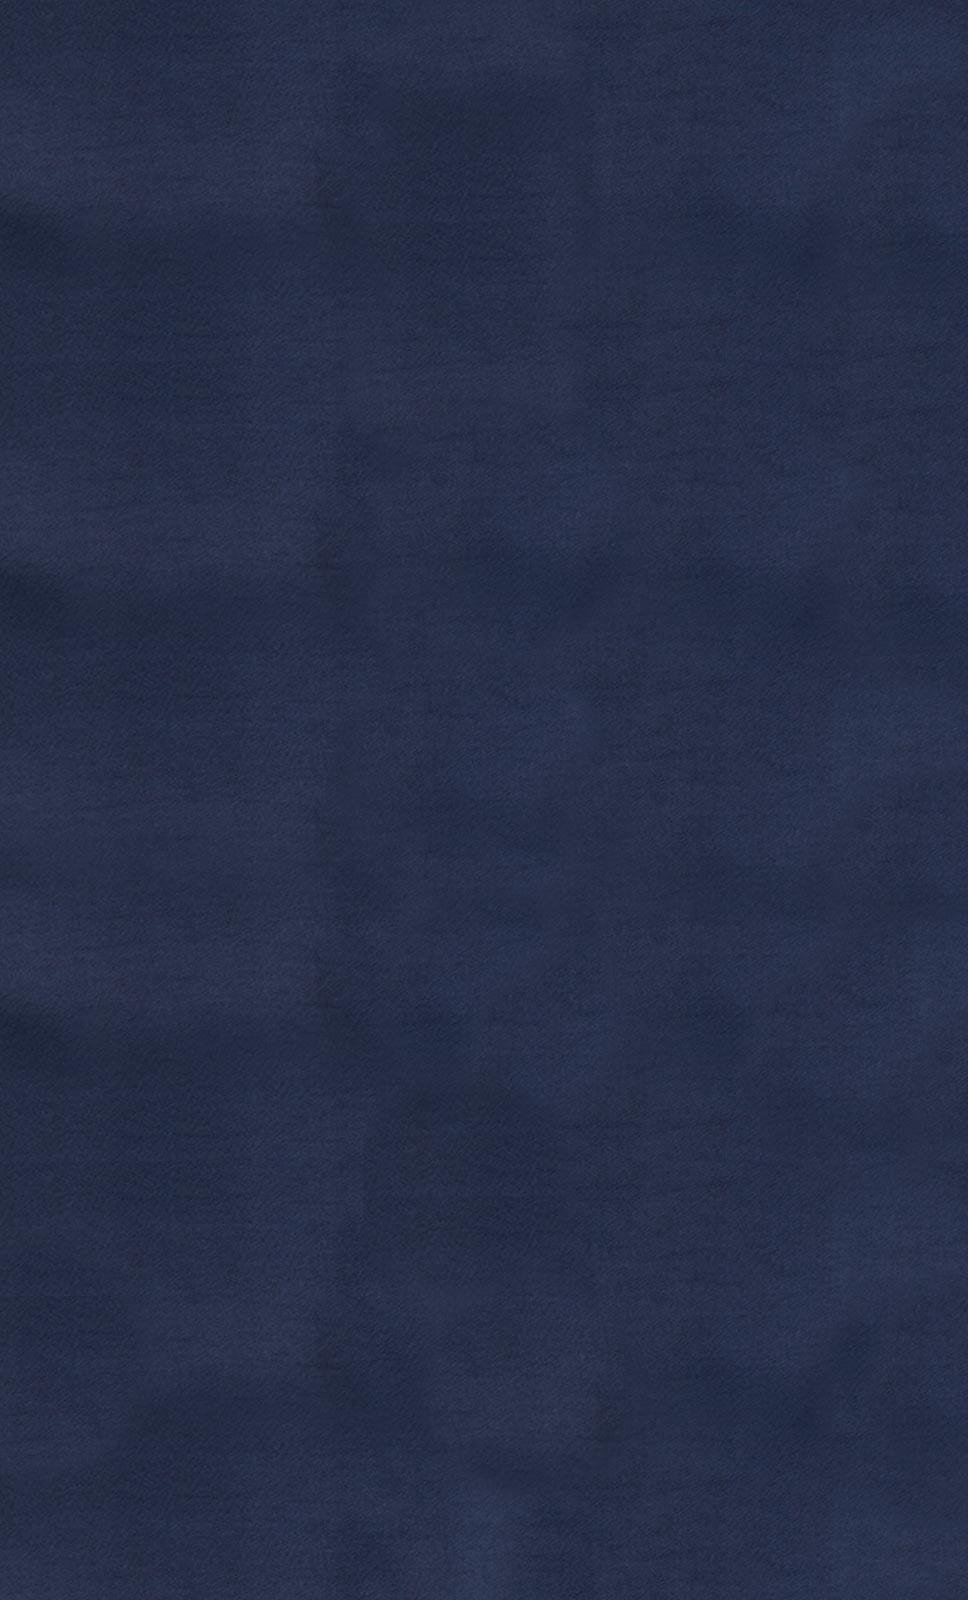 Satin-Viscose-Woven-Dark-Navy